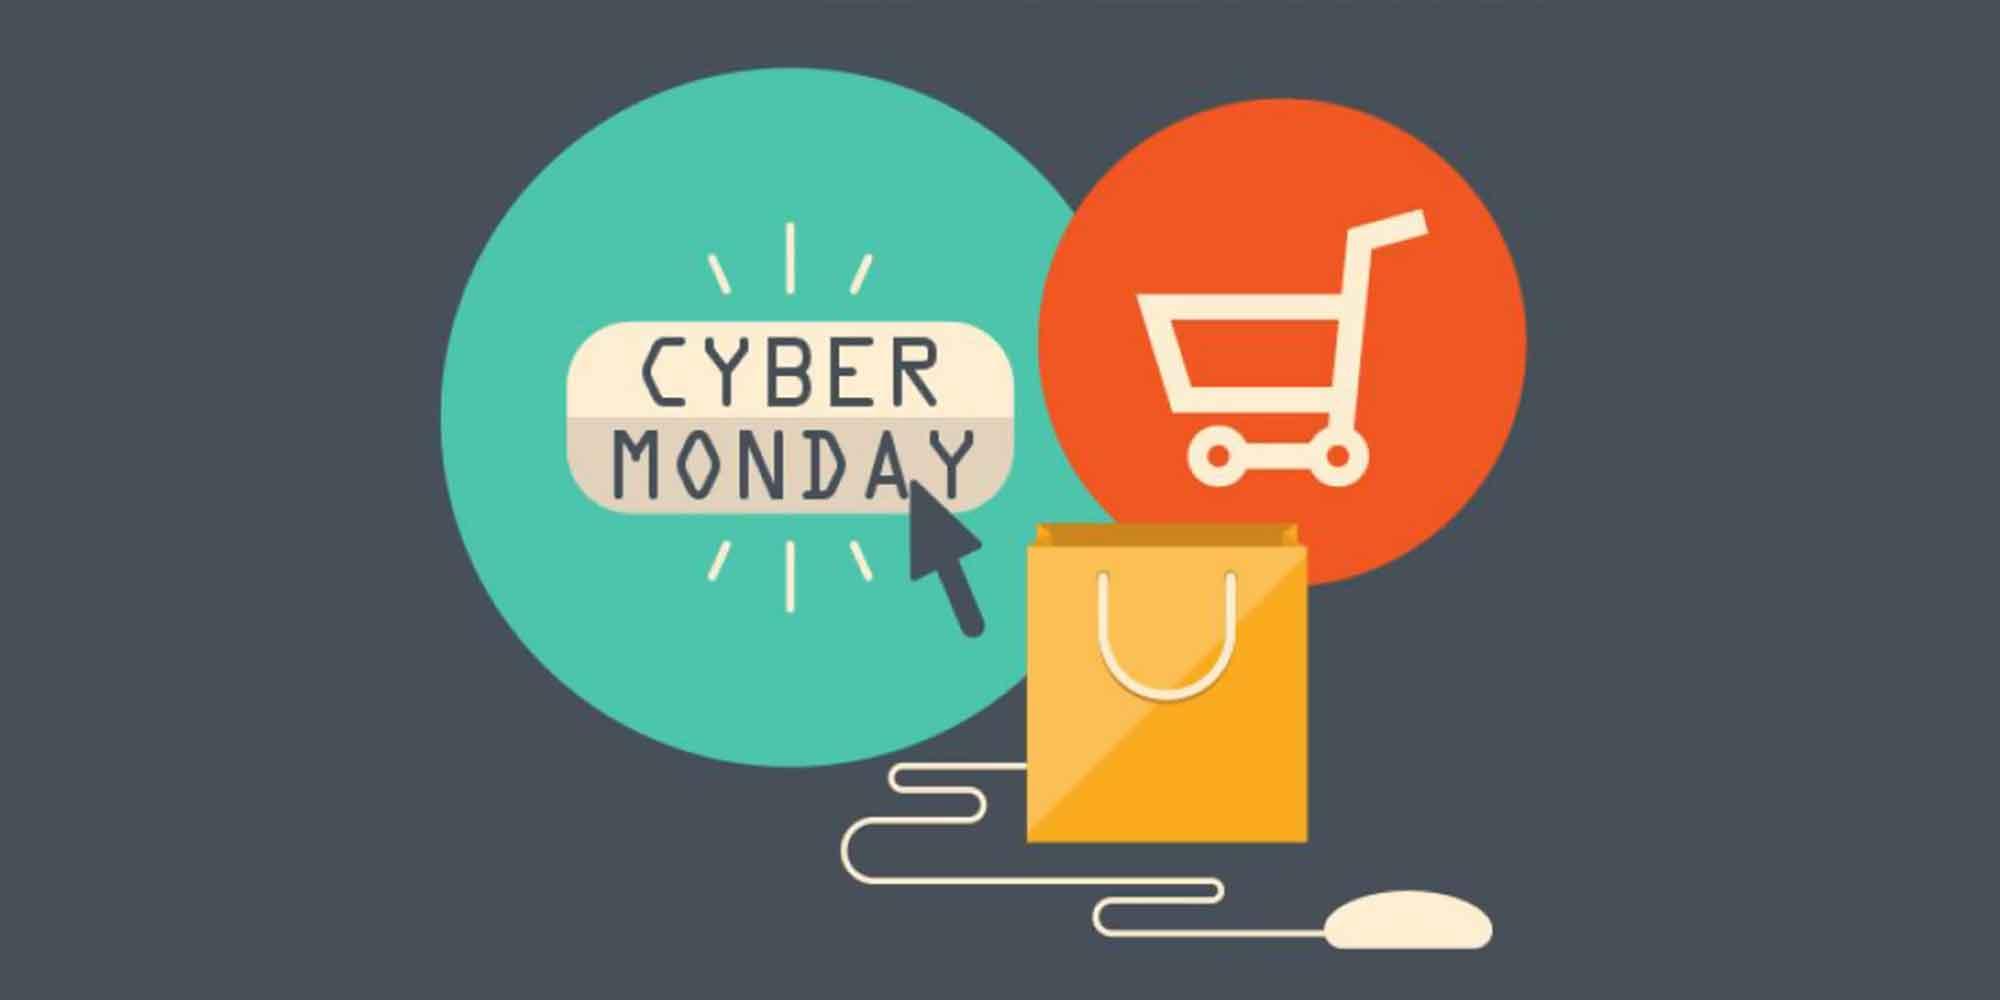 Cyber Monday یا دوشنبه سایبری: حراجی فروشگاههای آنلاین